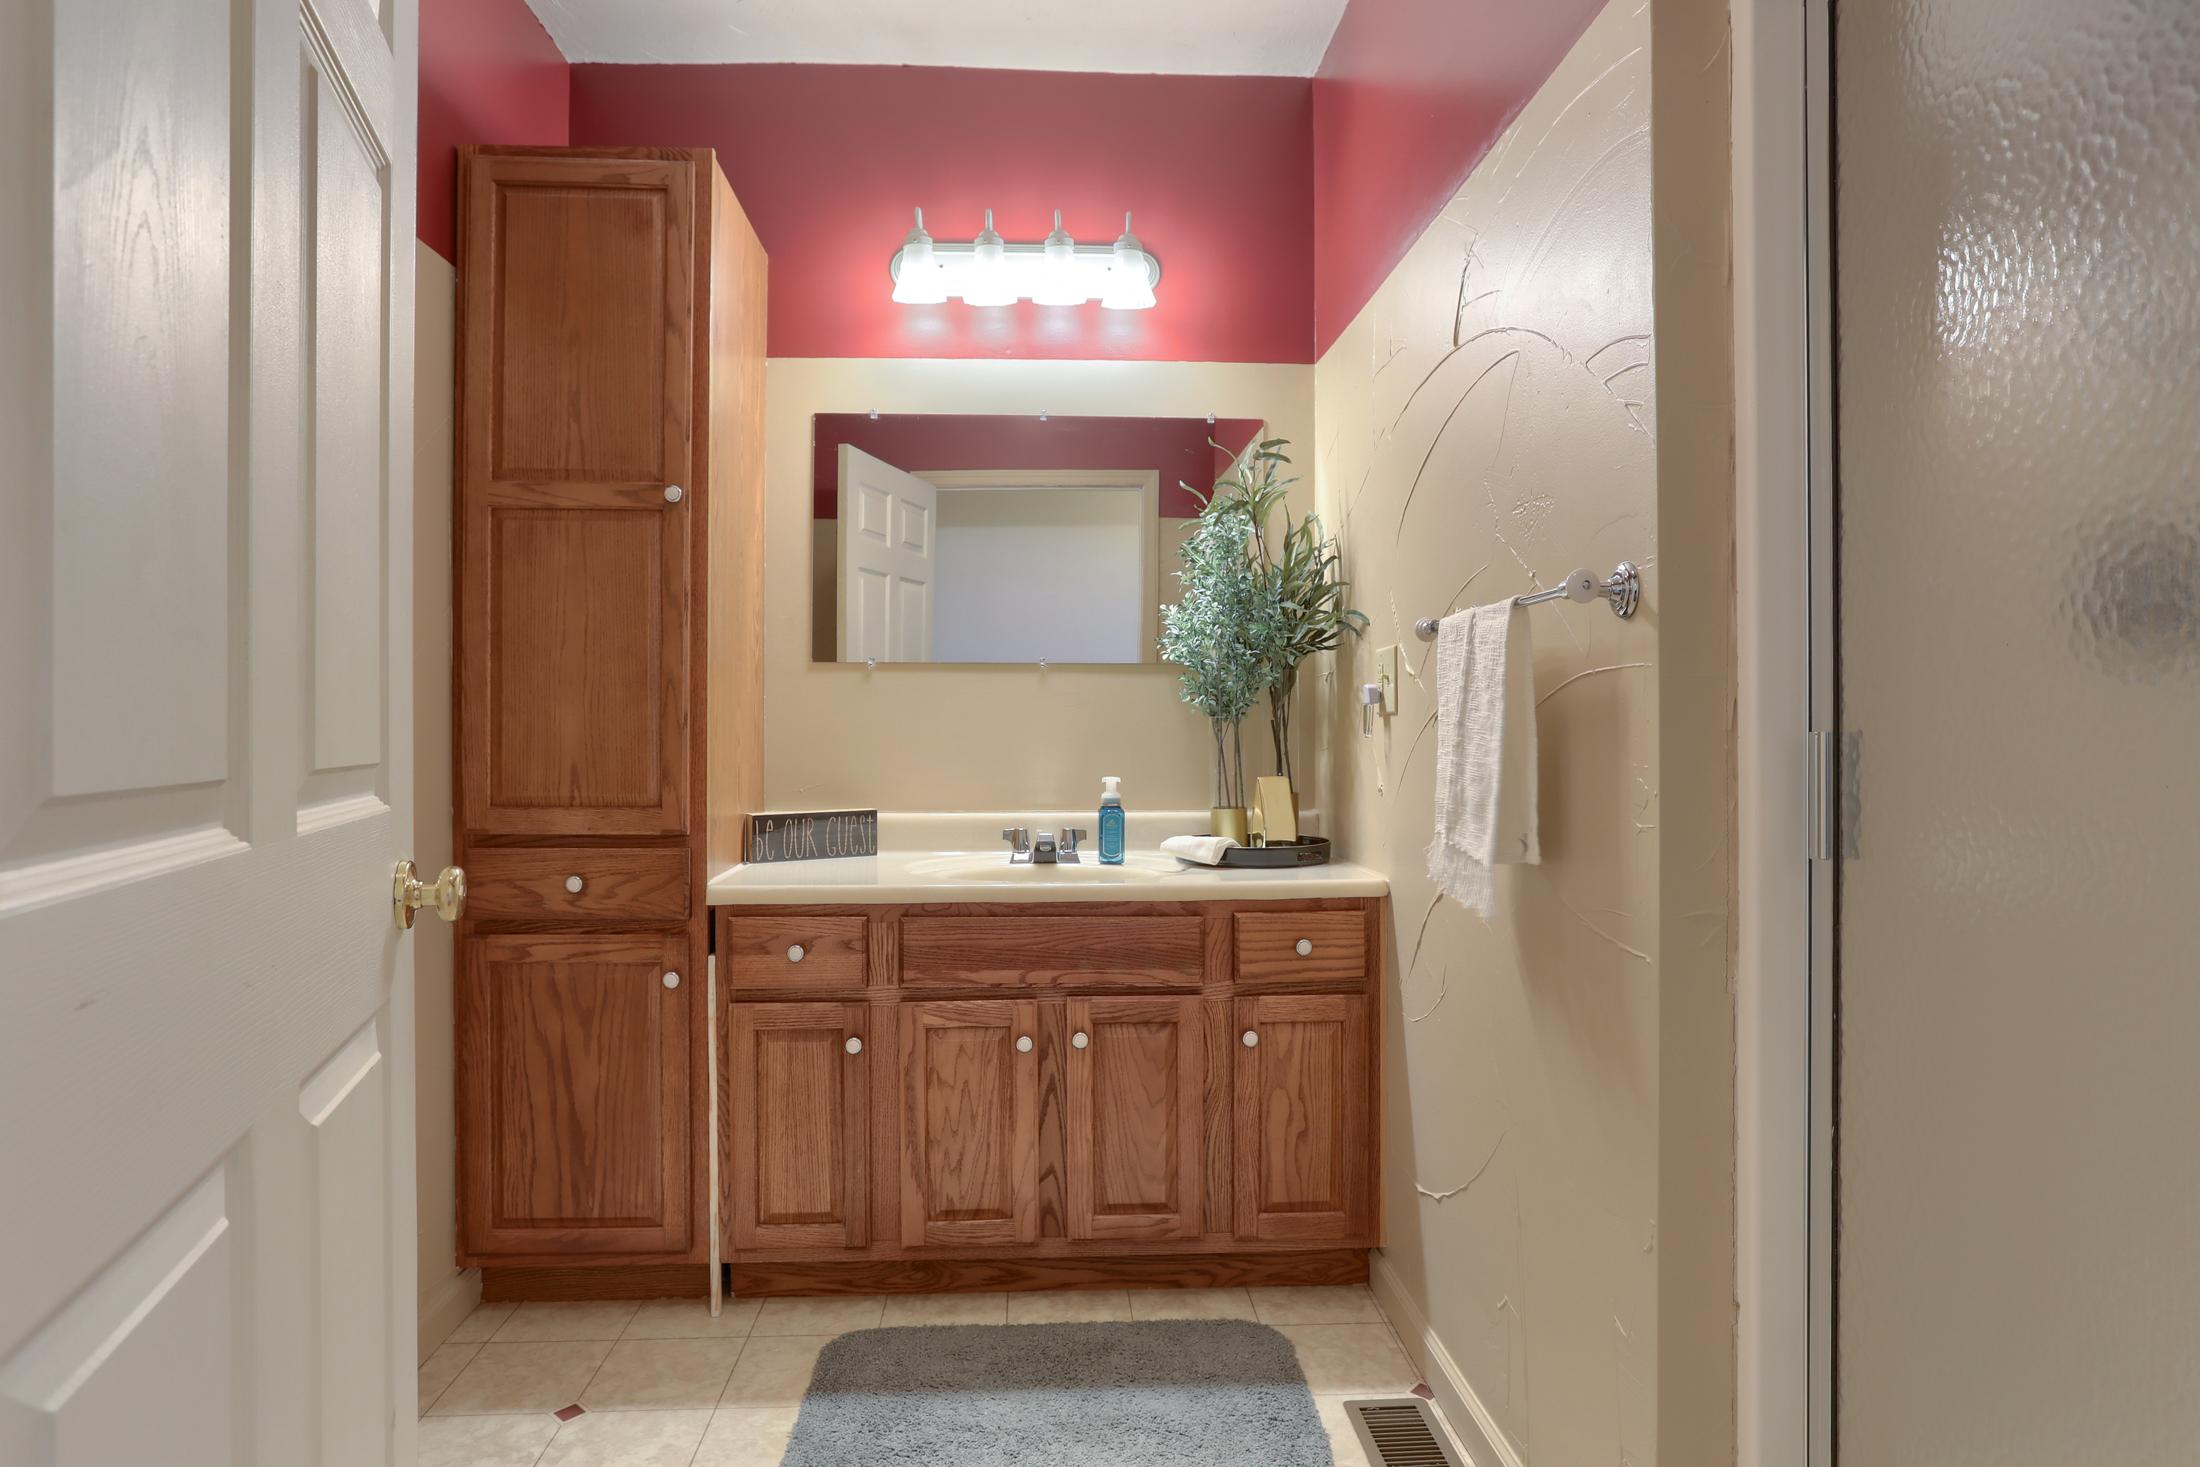 285 Strack Drive - Bathroom 2